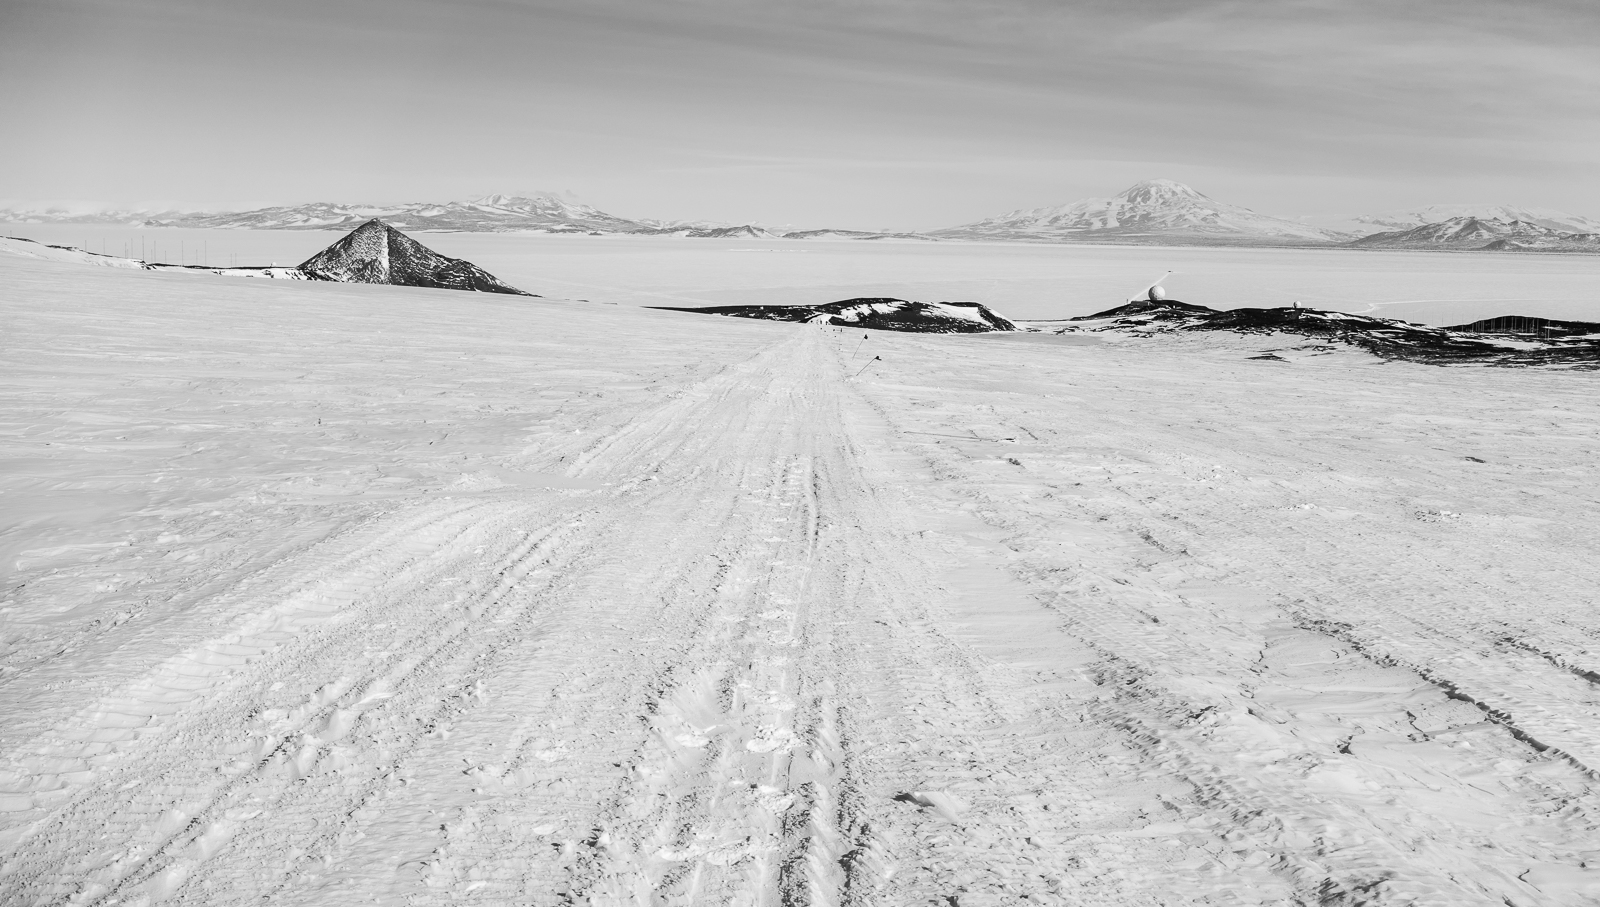 Heading back to McMurdo.